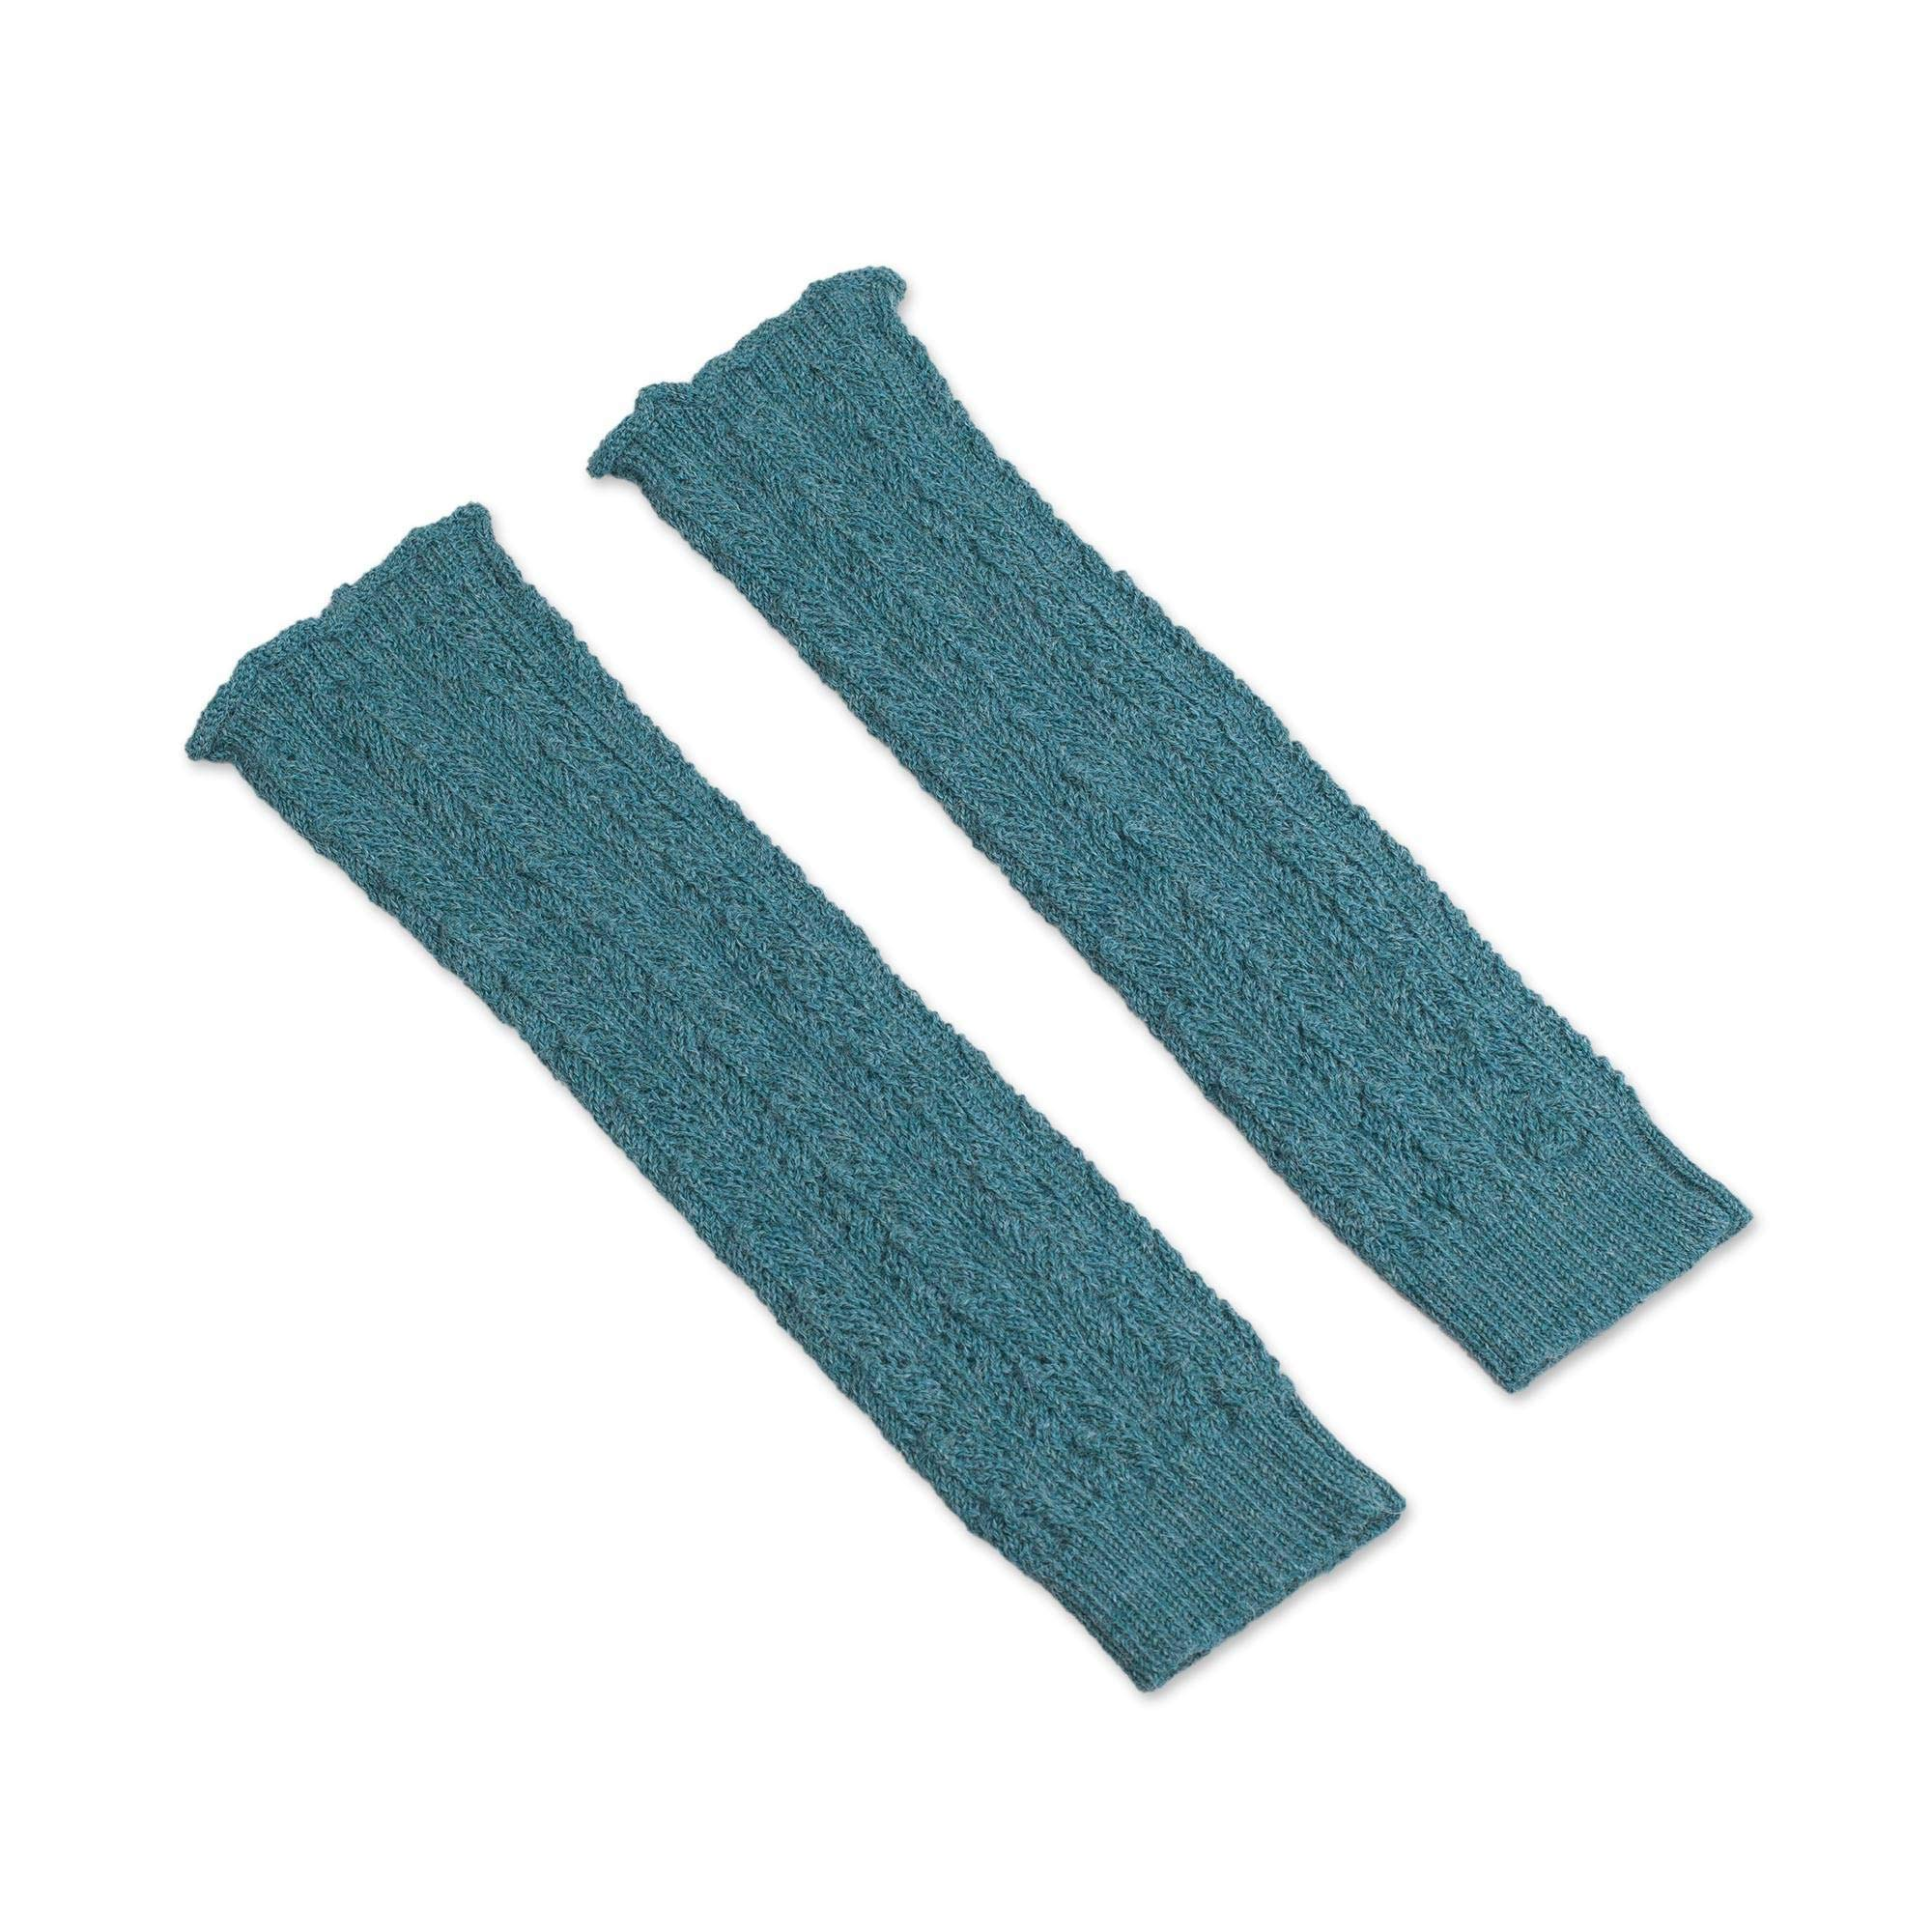 NOVICA Turquoise Blue 100% Alpaca Leg Warmers, River Rapids' by NOVICA